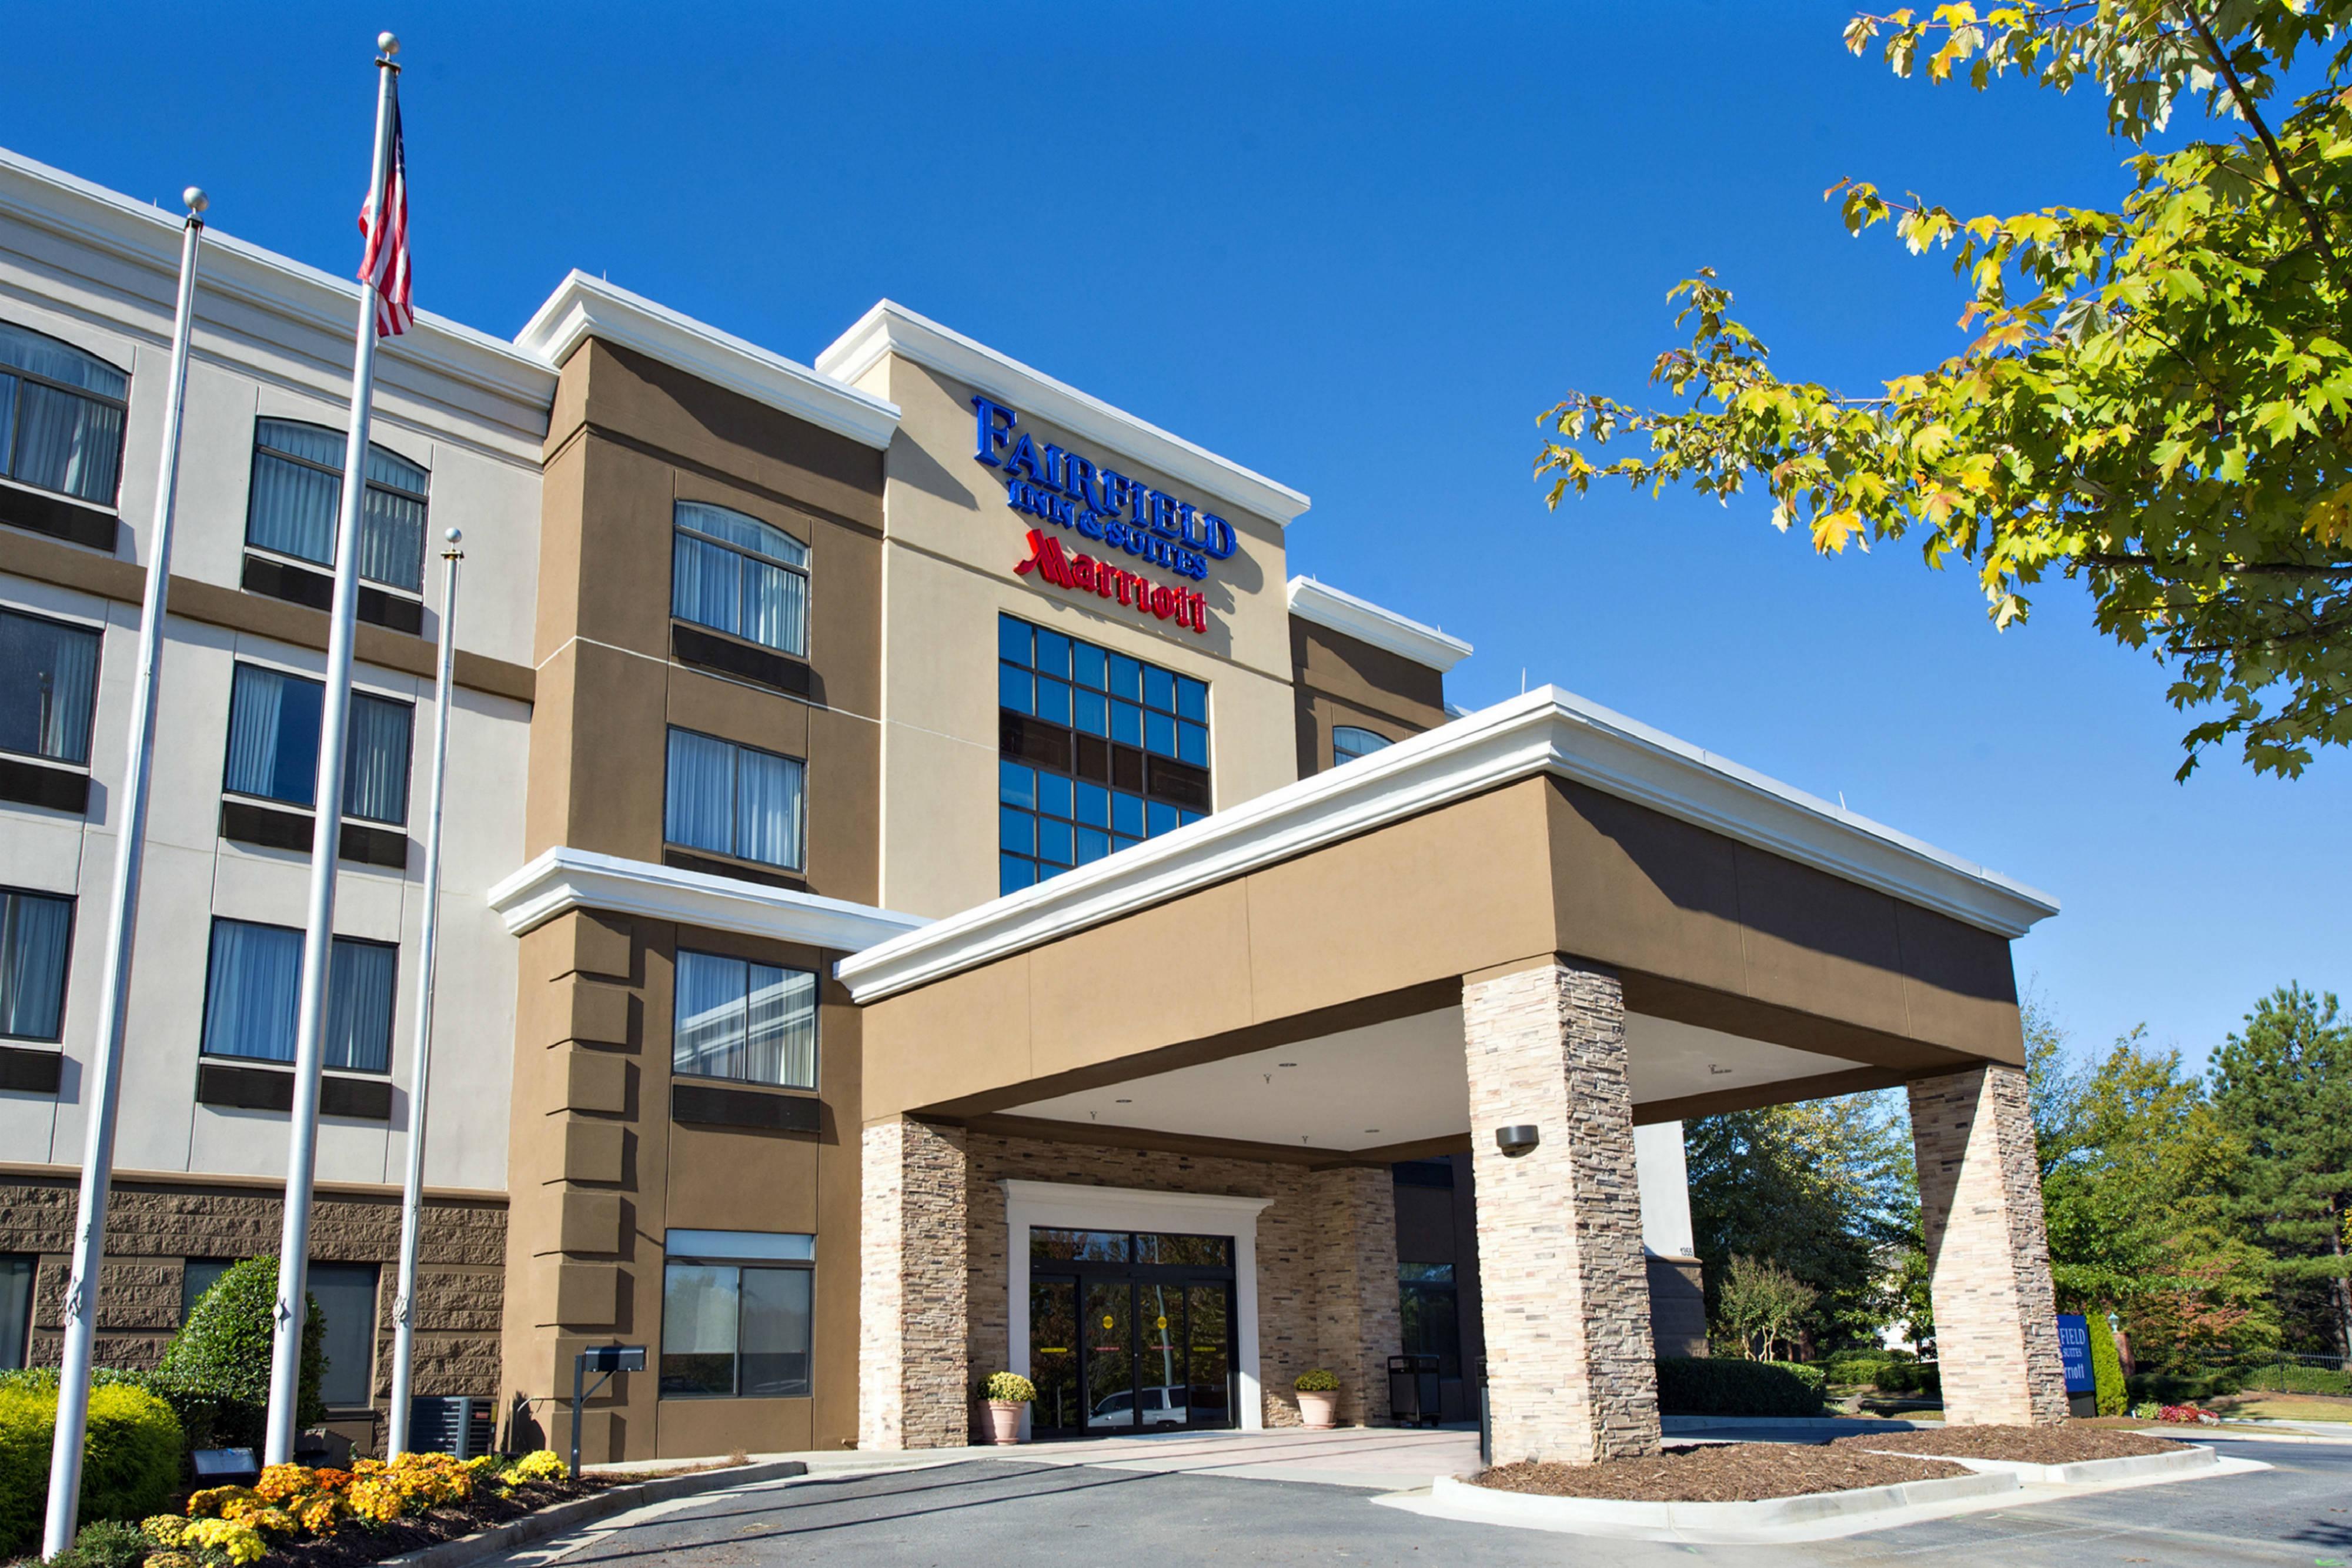 Fairfield Inn & Suites Marriott Atlanta Buford/mall Of Georgia